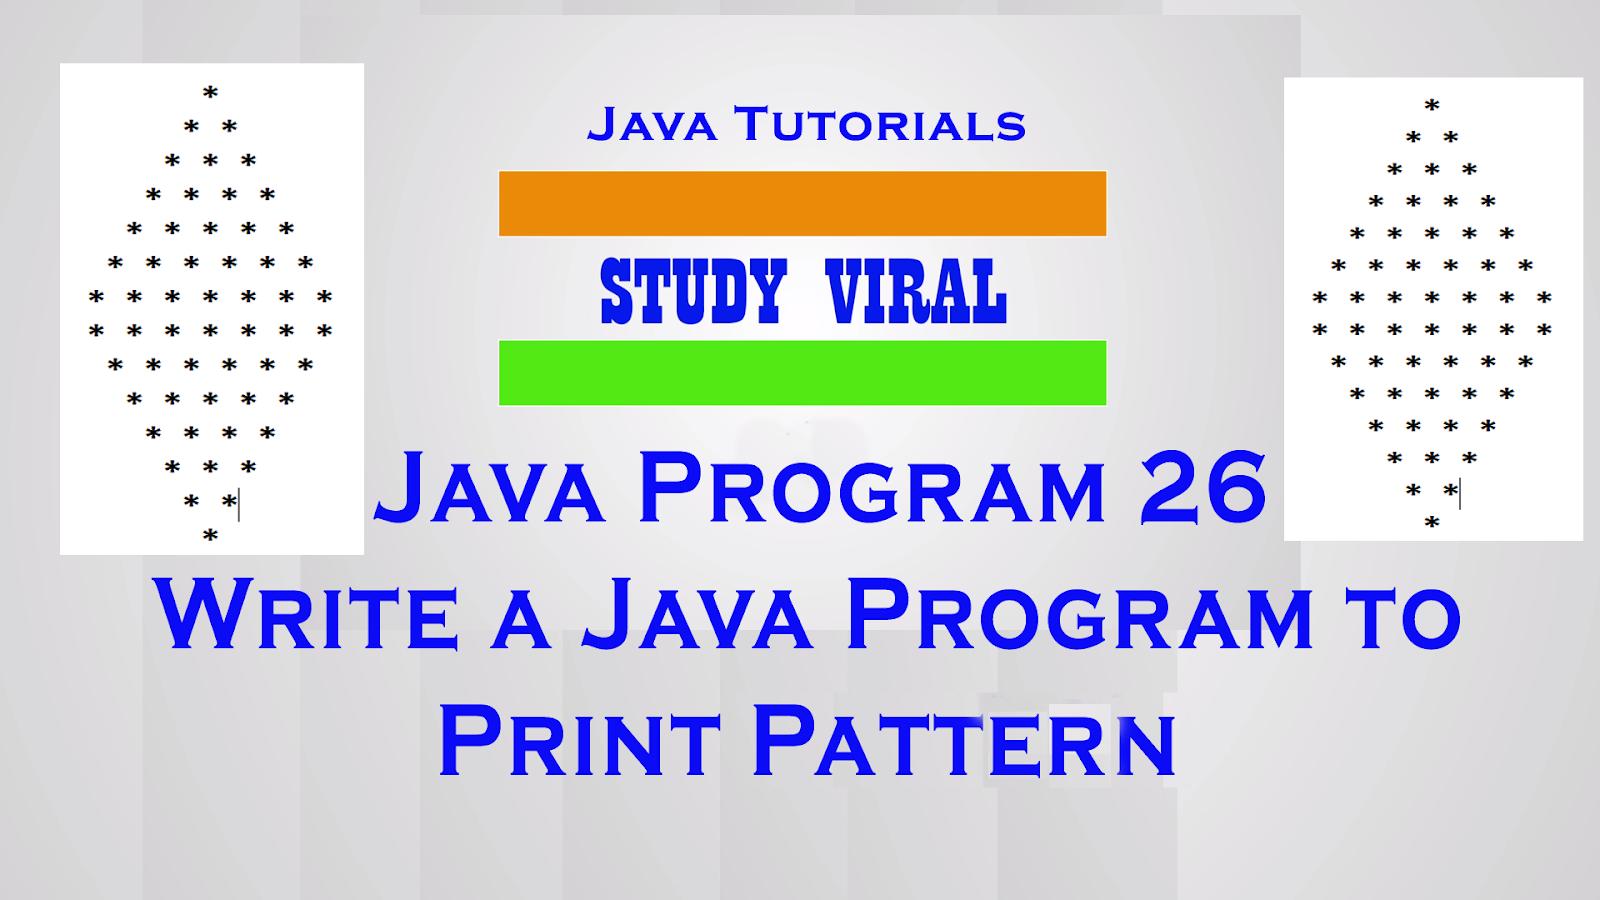 Java Program 26 - Java Program to Print Star Pyramid